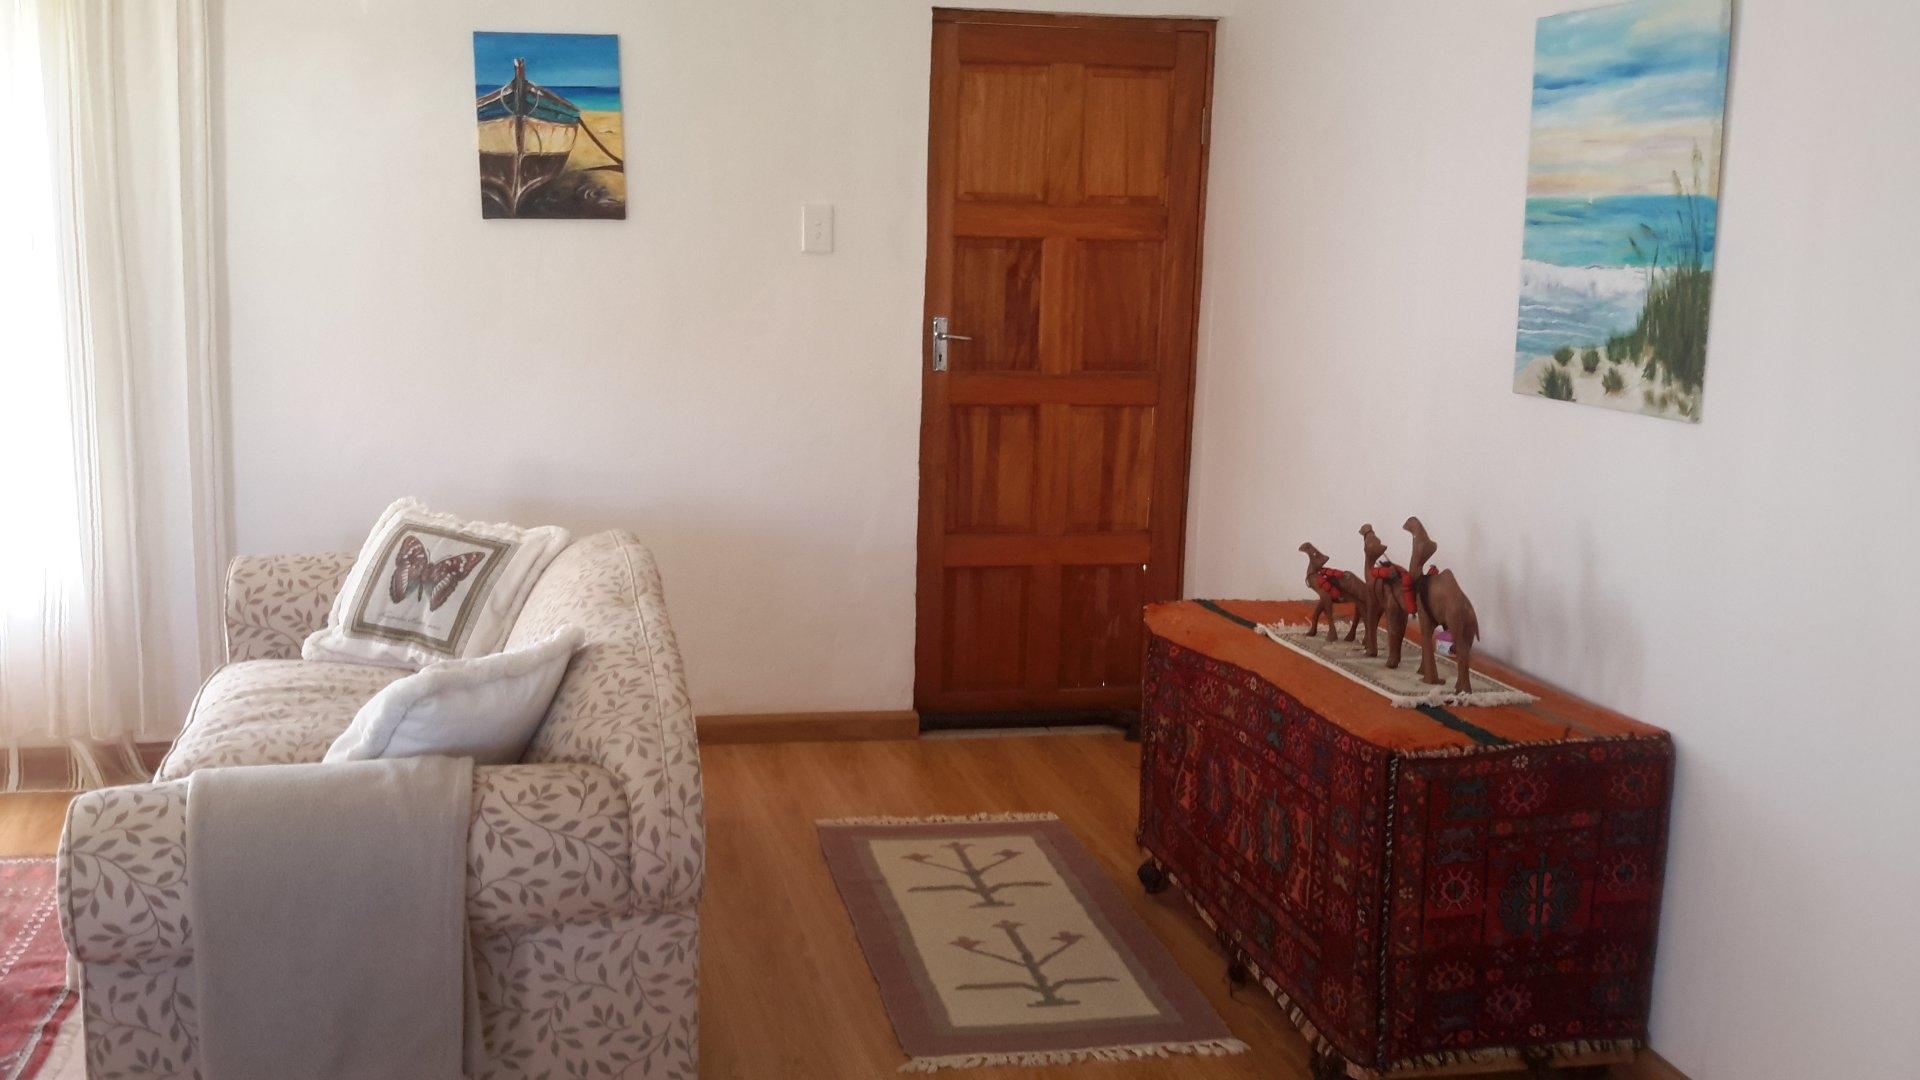 Flatlet entrance and living area